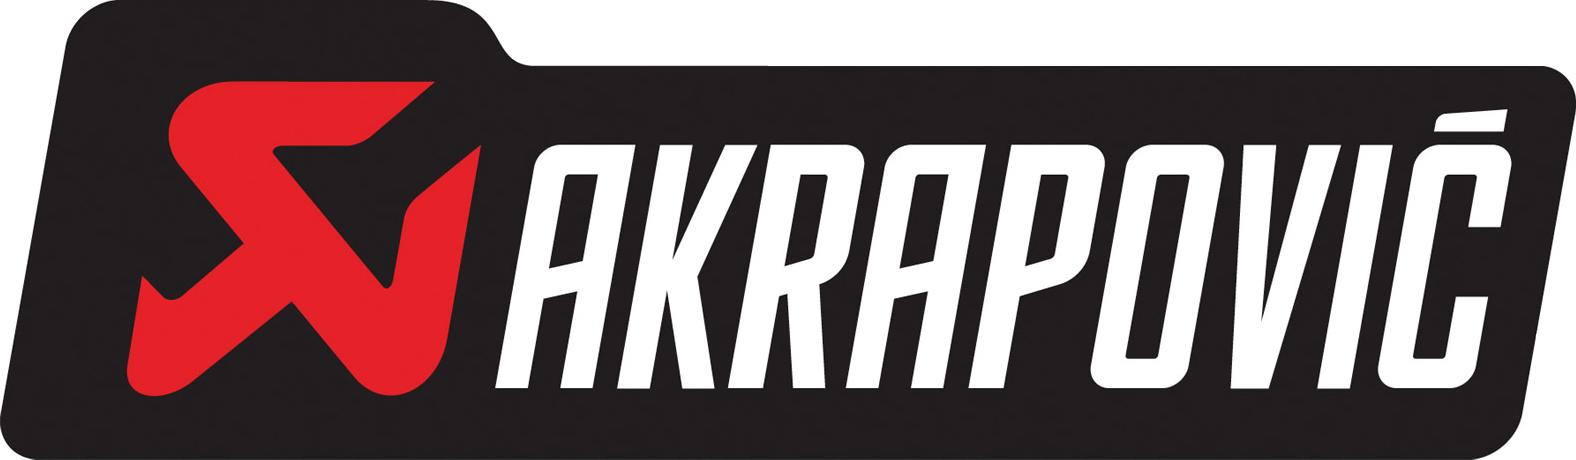 Akra logo trans